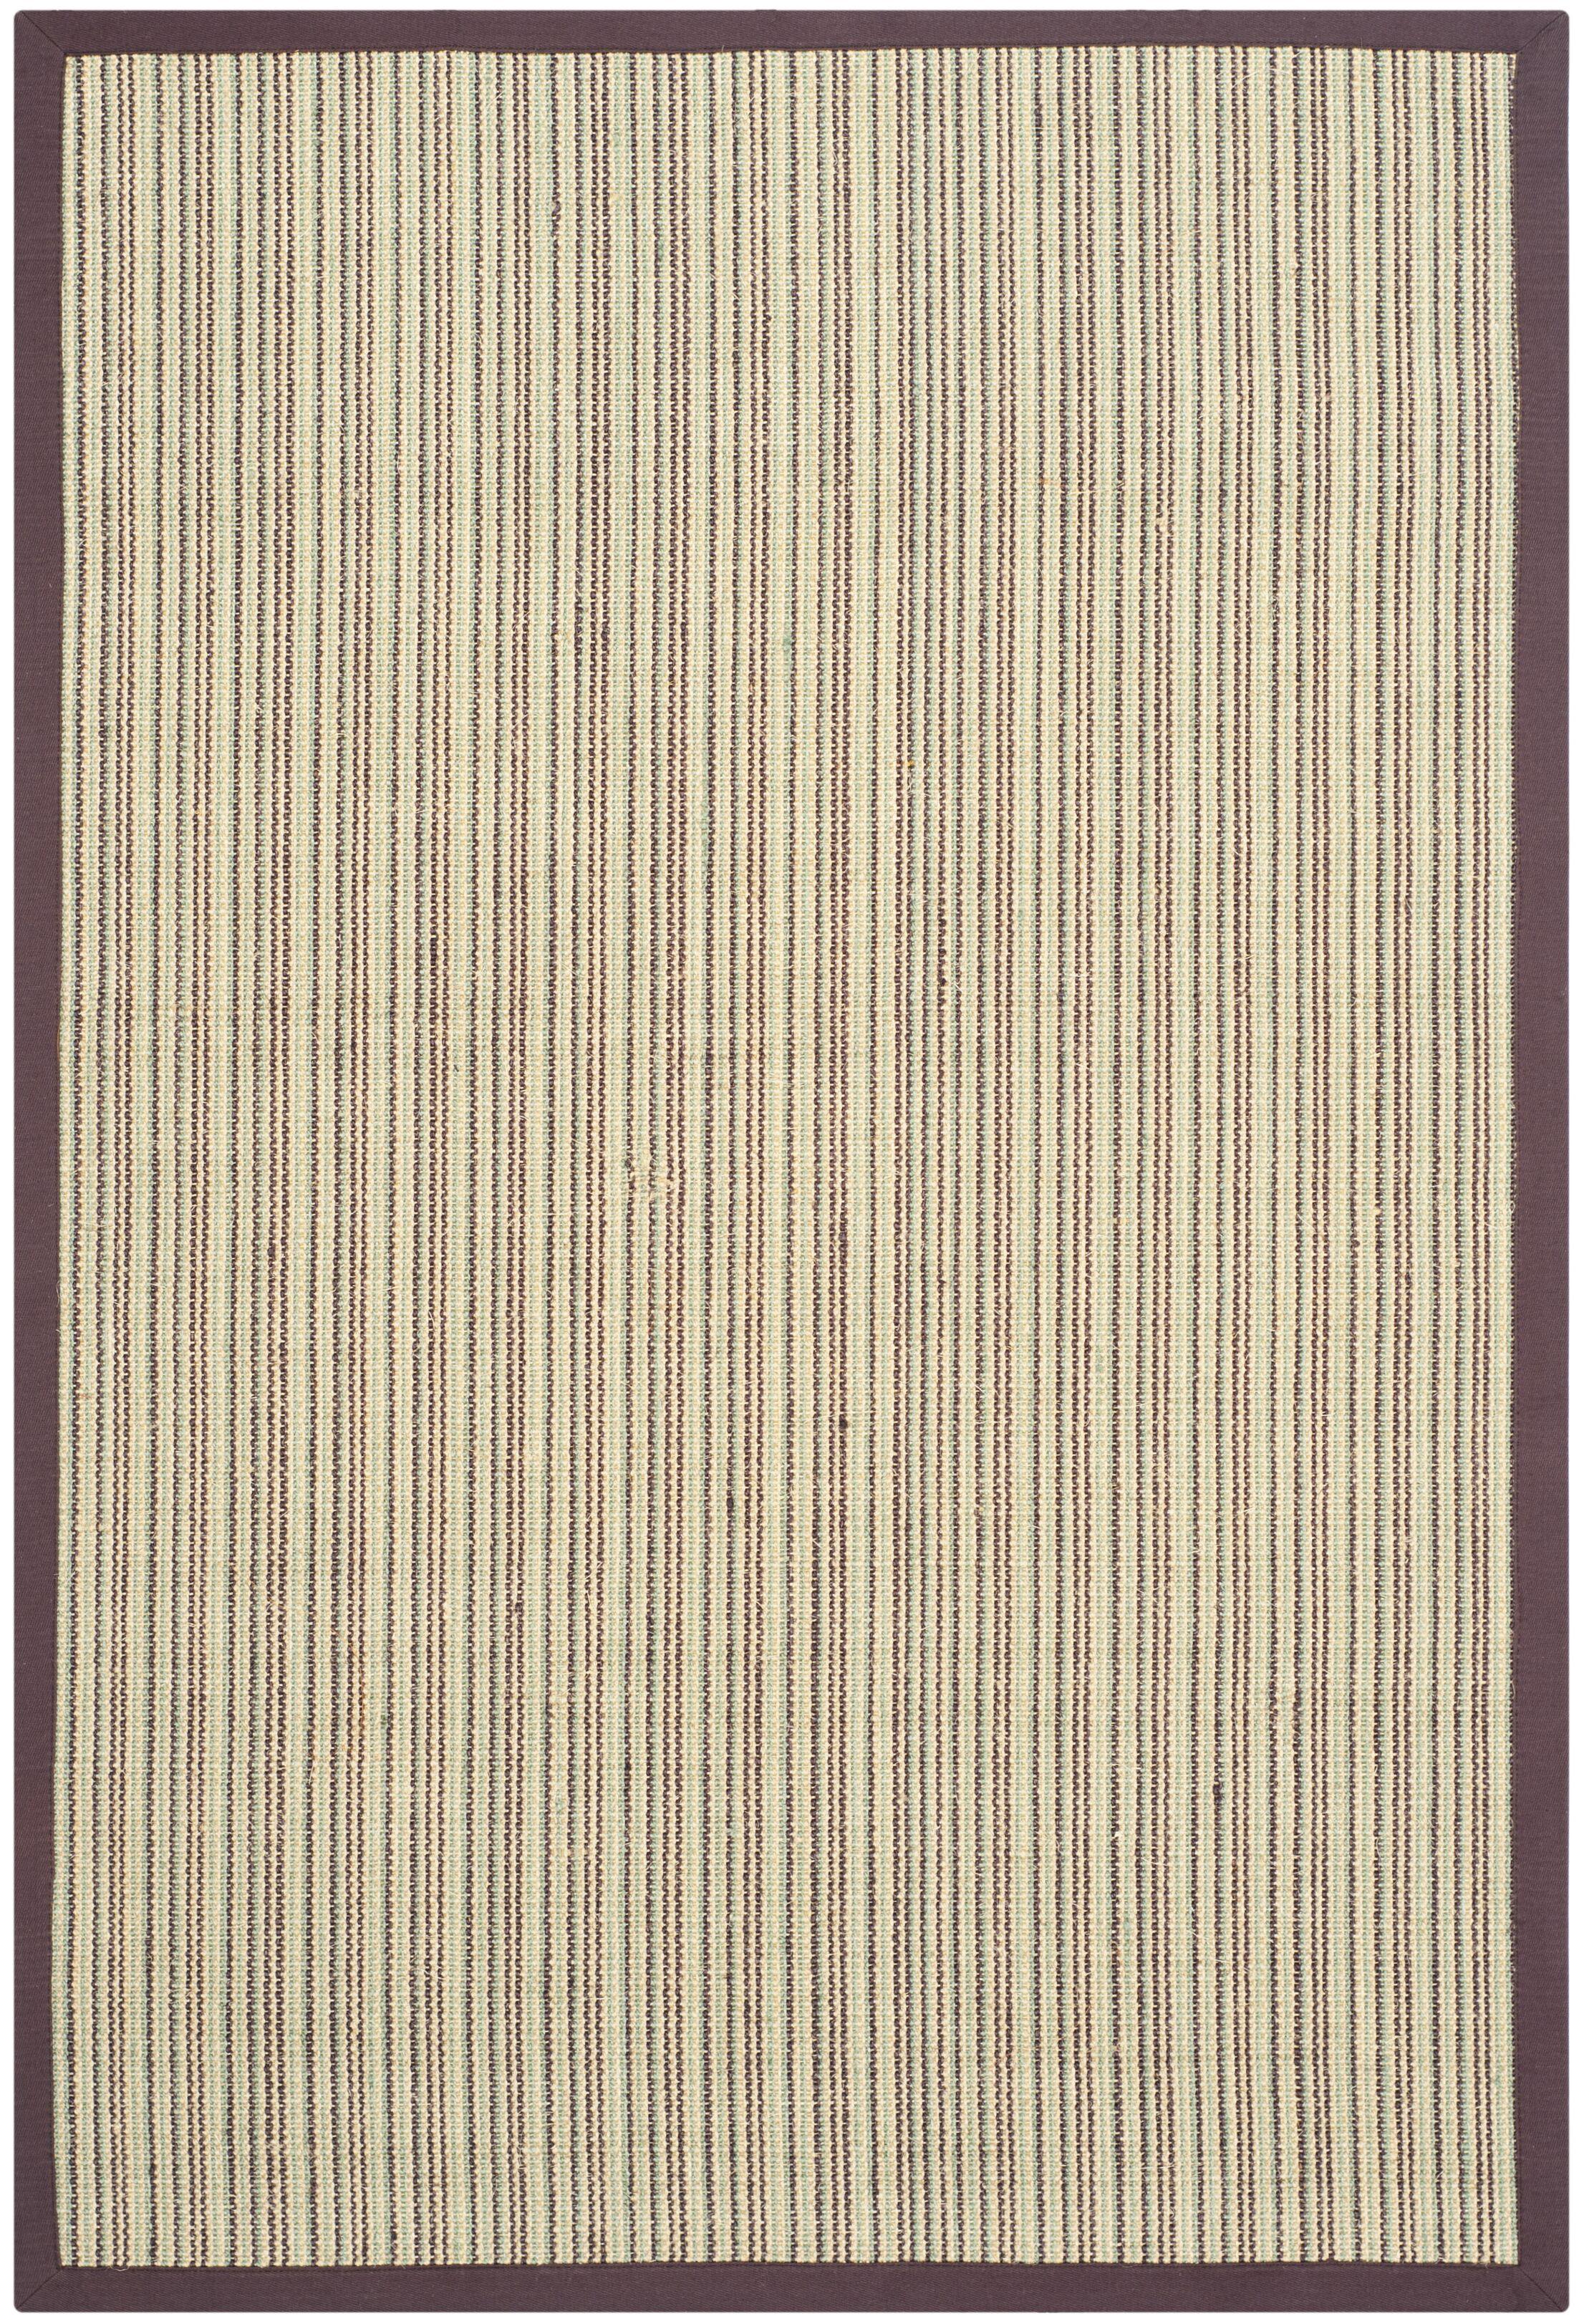 Greene Hand-Woven Blue/Purple Rug Rug Size: Rectangle 9' x 12'